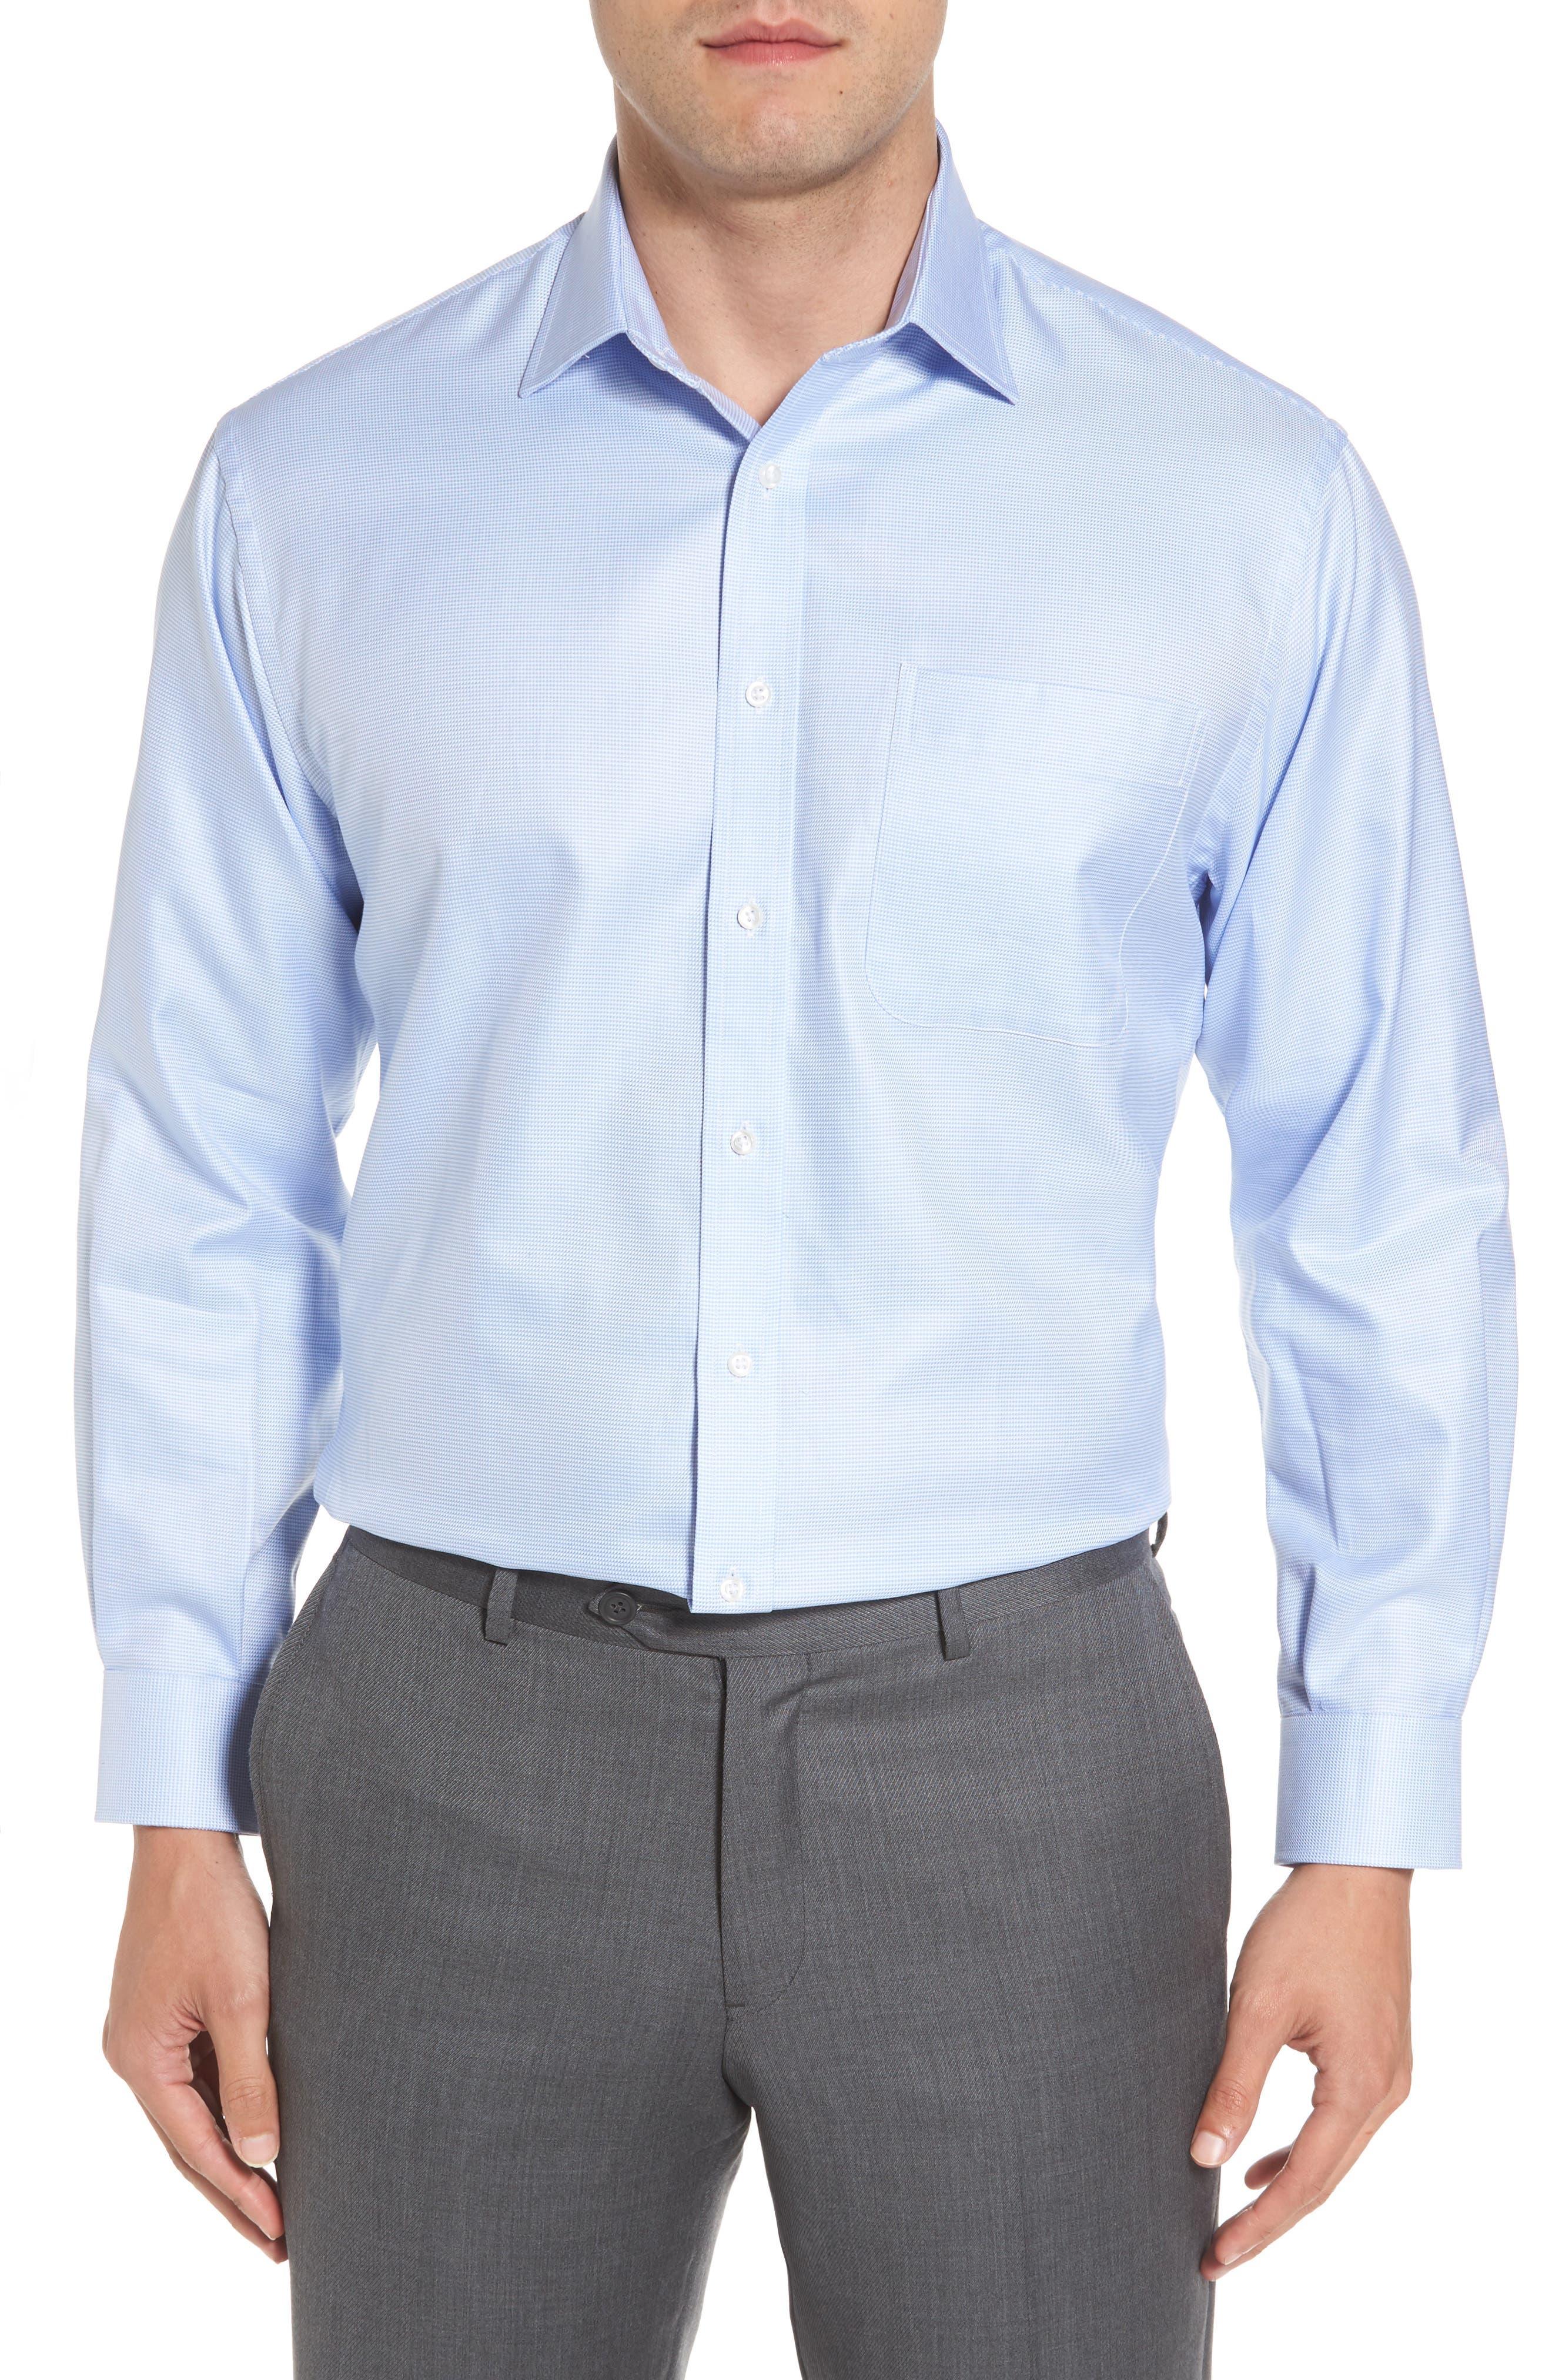 NORDSTROM MEN'S SHOP, Classic Fit Microgrid Dress Shirt, Main thumbnail 1, color, BLUE ROBIN